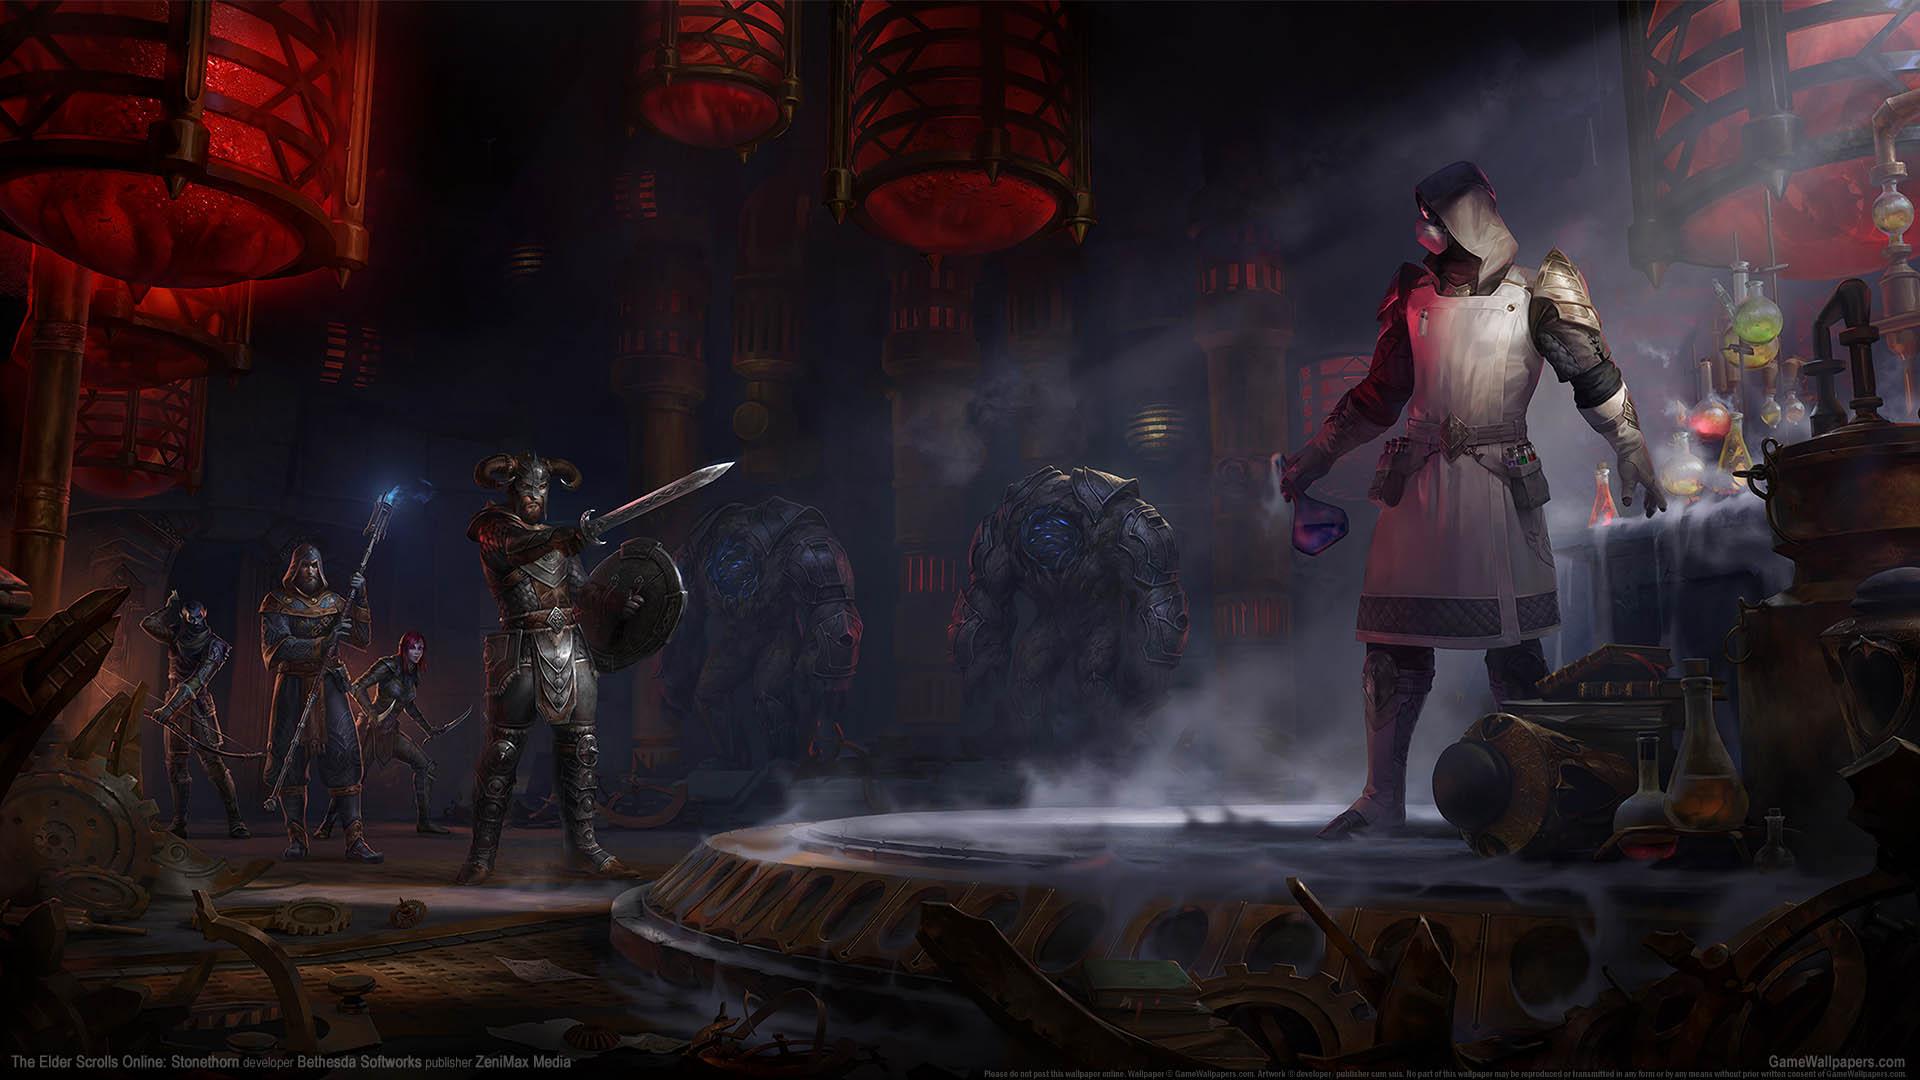 The Elder Scrolls Online: Stonethorn fondo de escritorio 01 1920x1080